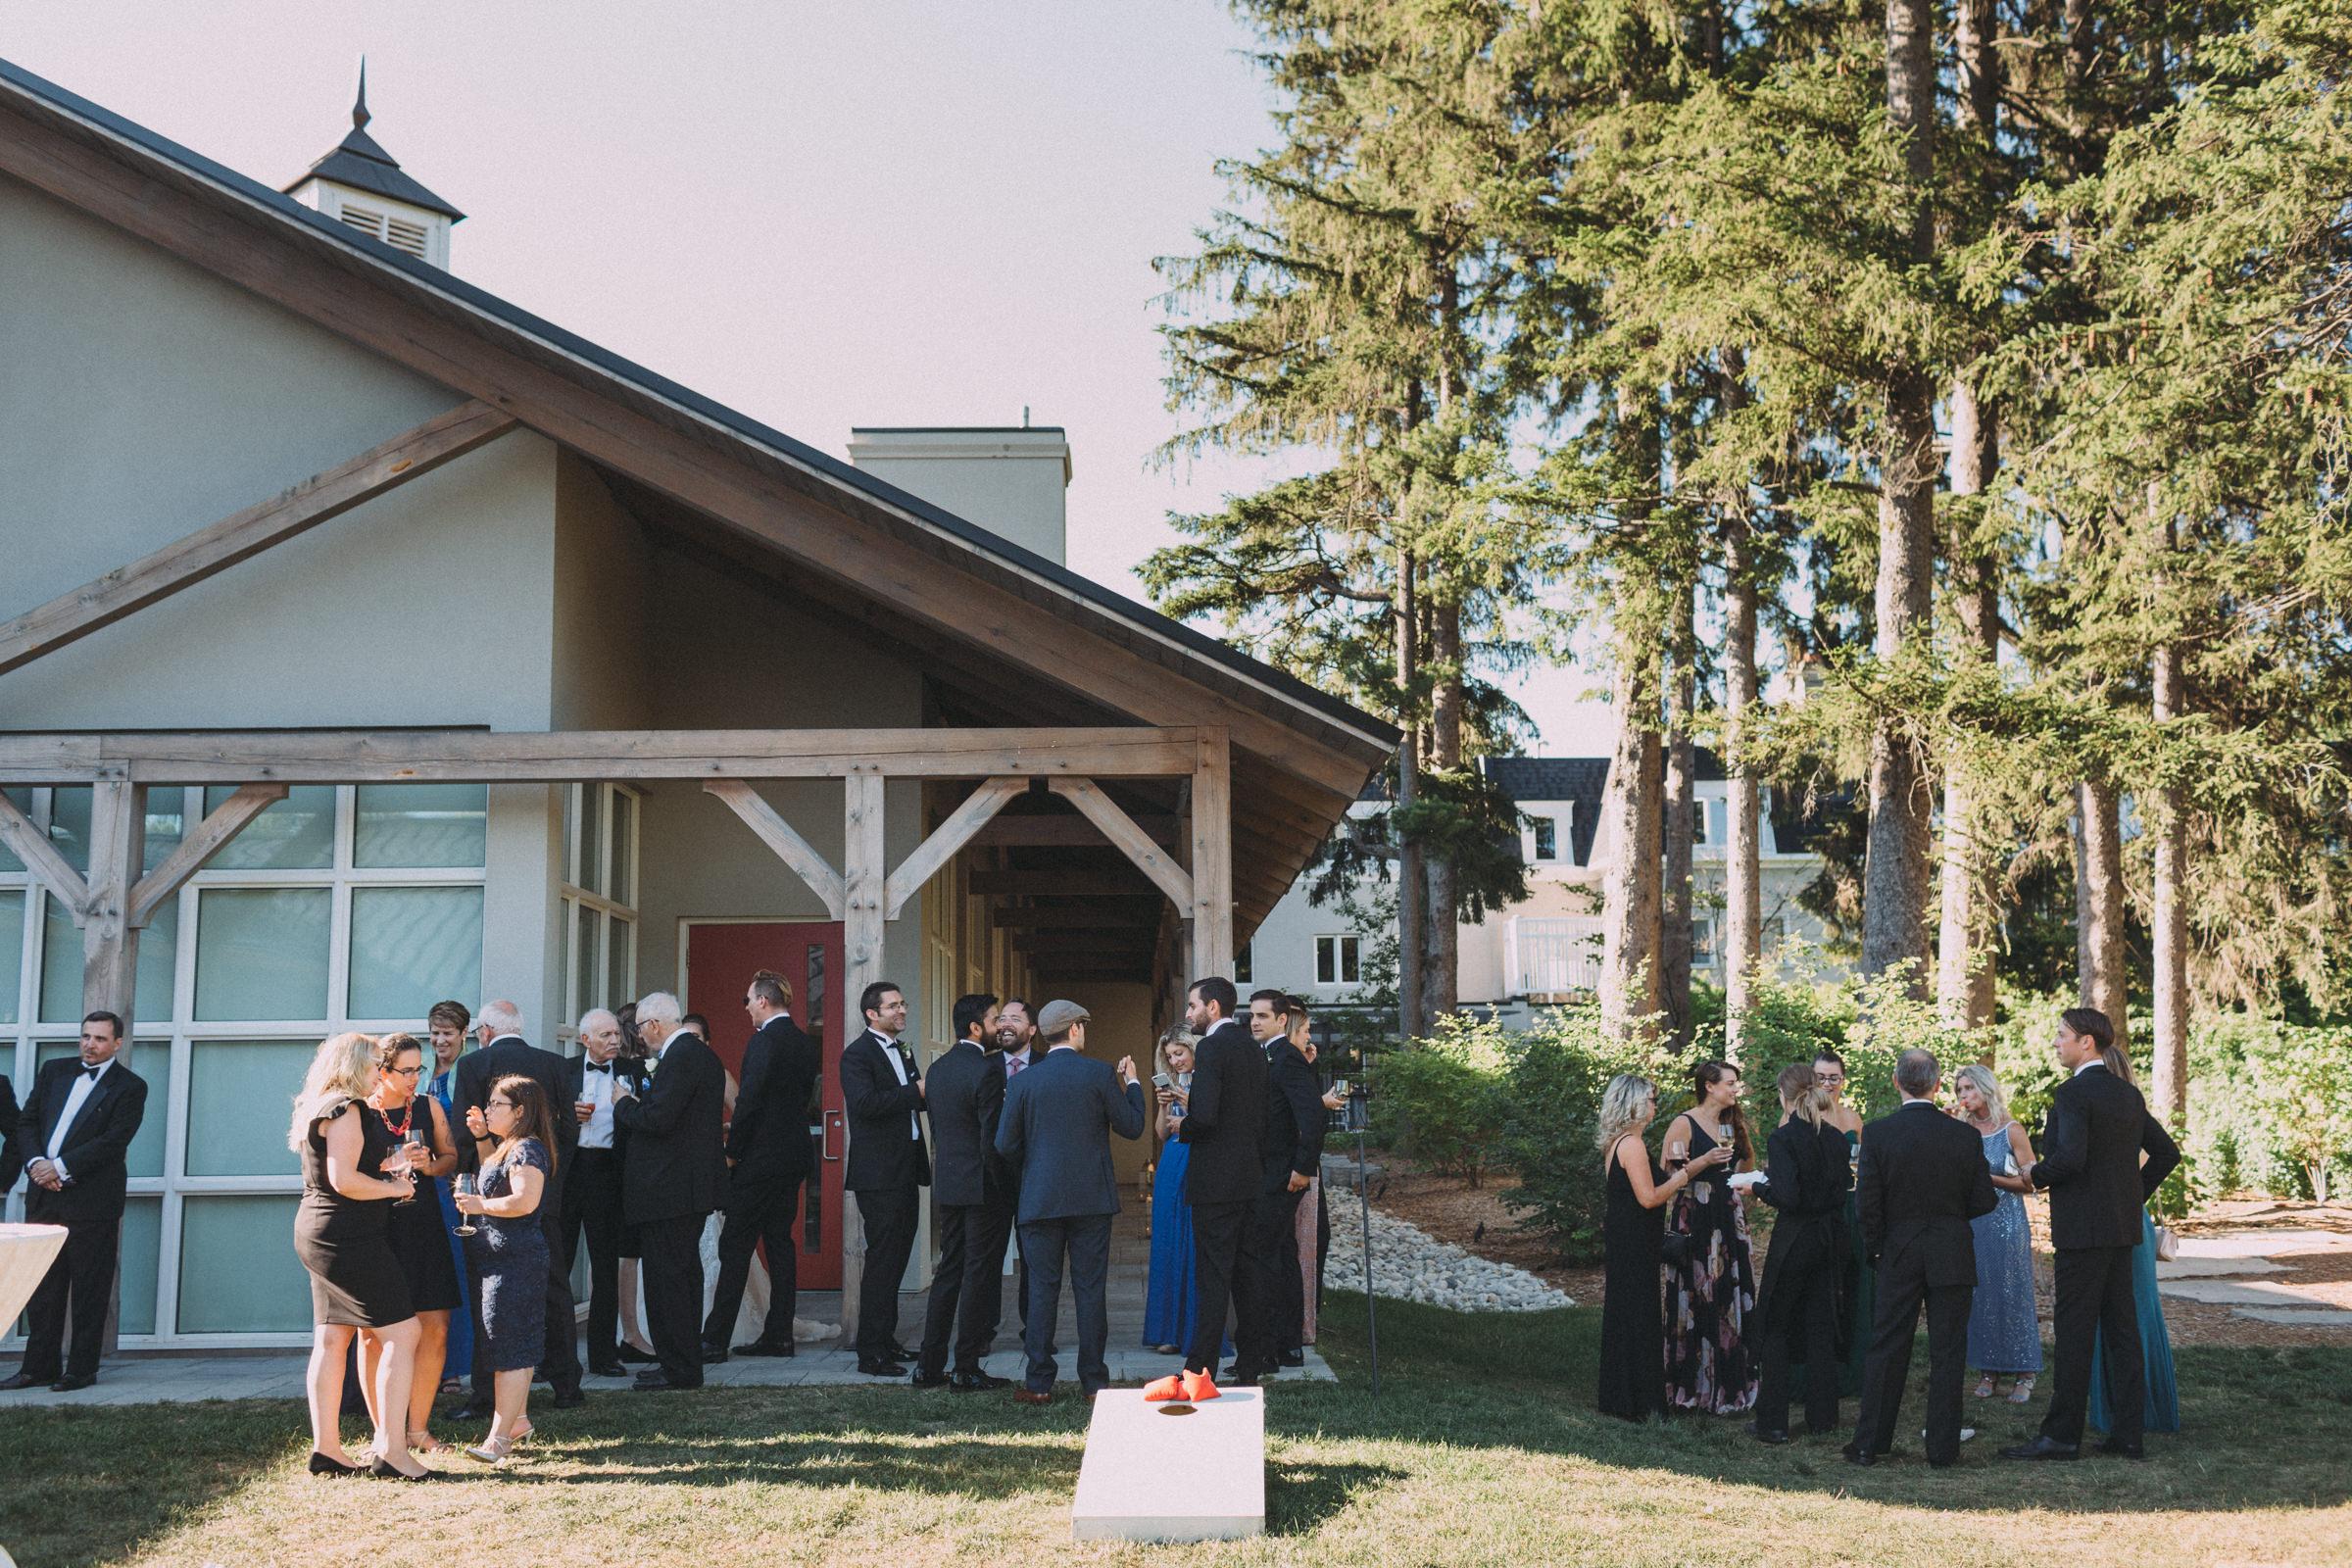 Langdon-Hall-wedding-photography-Cambridge-by-Sam-Wong-of-Visual-Cravings_Sarah-Ryan_44.jpg